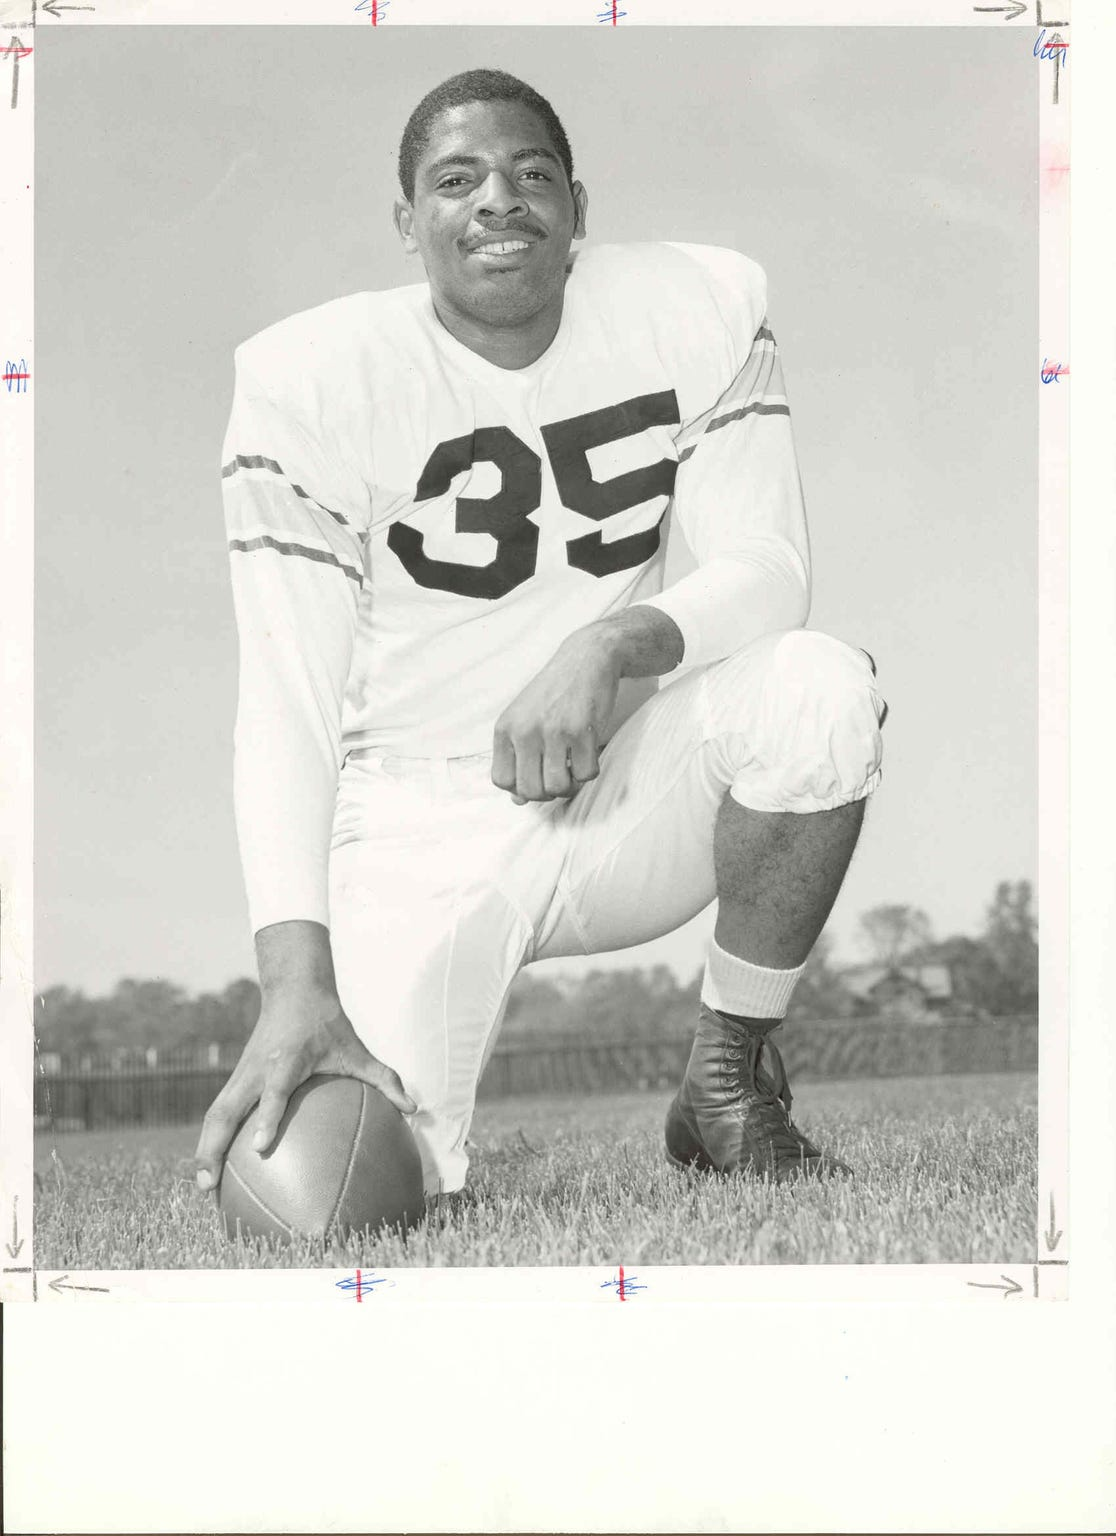 Purdue fullback Mel Dillard had four 100-yard rushing games in 1956.